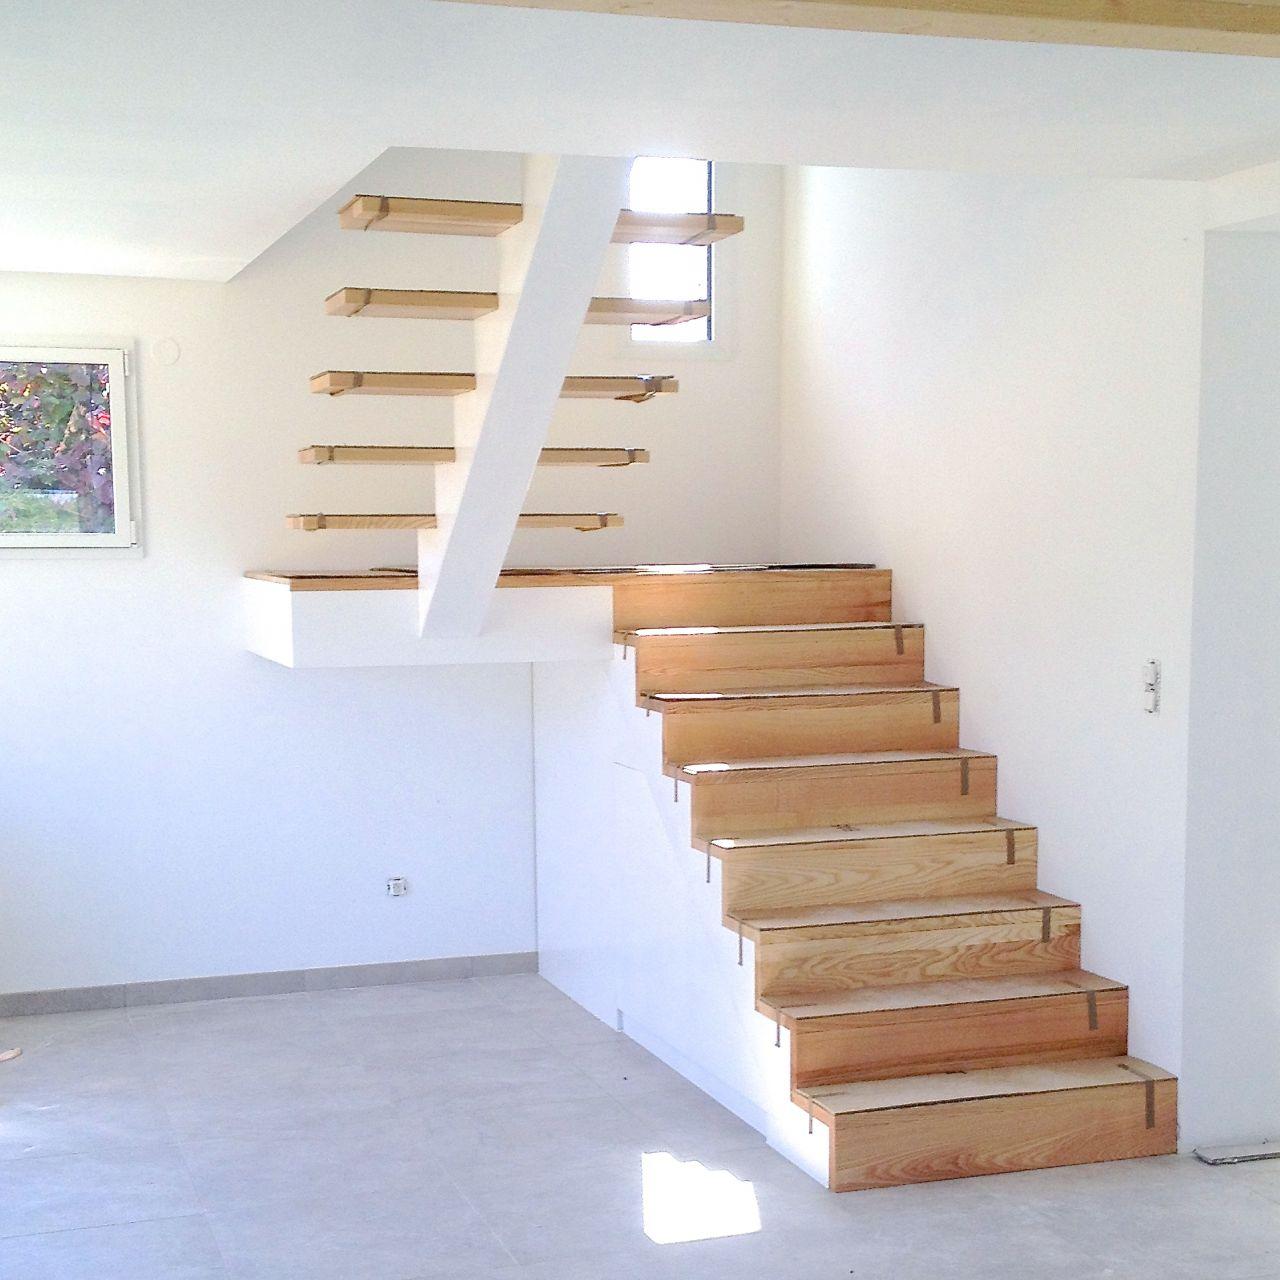 L'escalier fini en attente de garde-corps